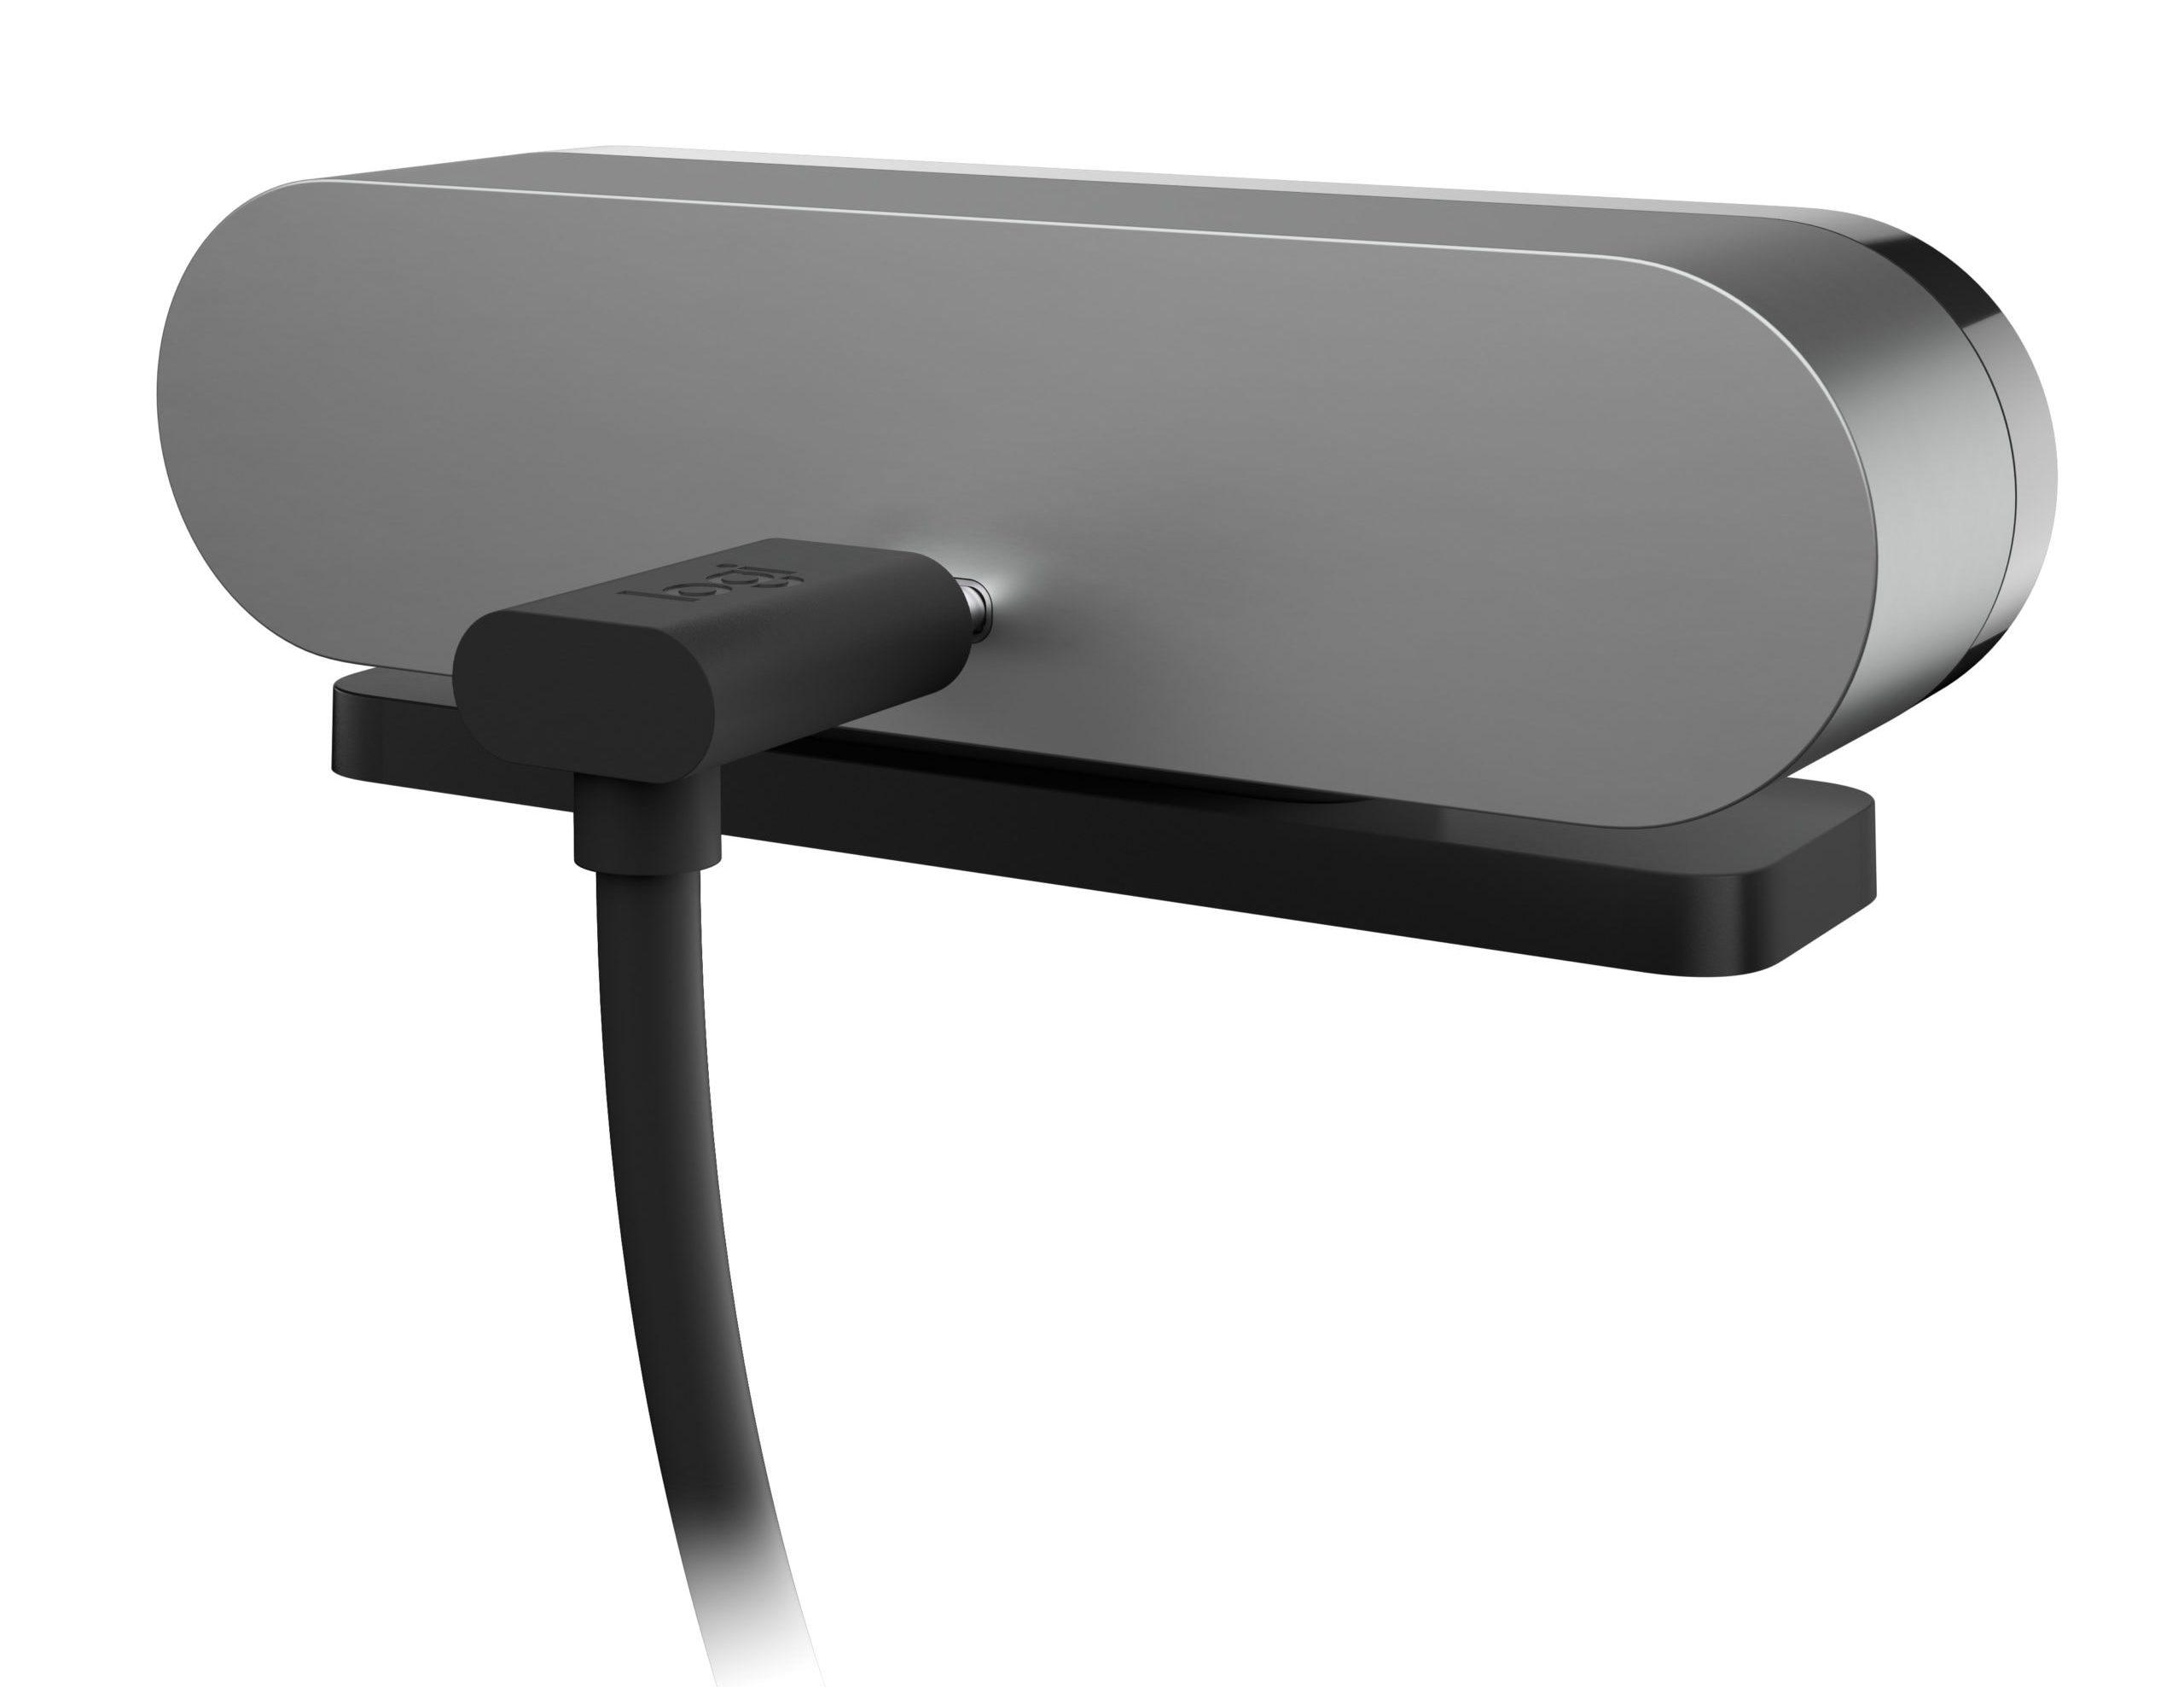 The Logitech 4K Pro Magnetic Webcam plug looks pretty normal